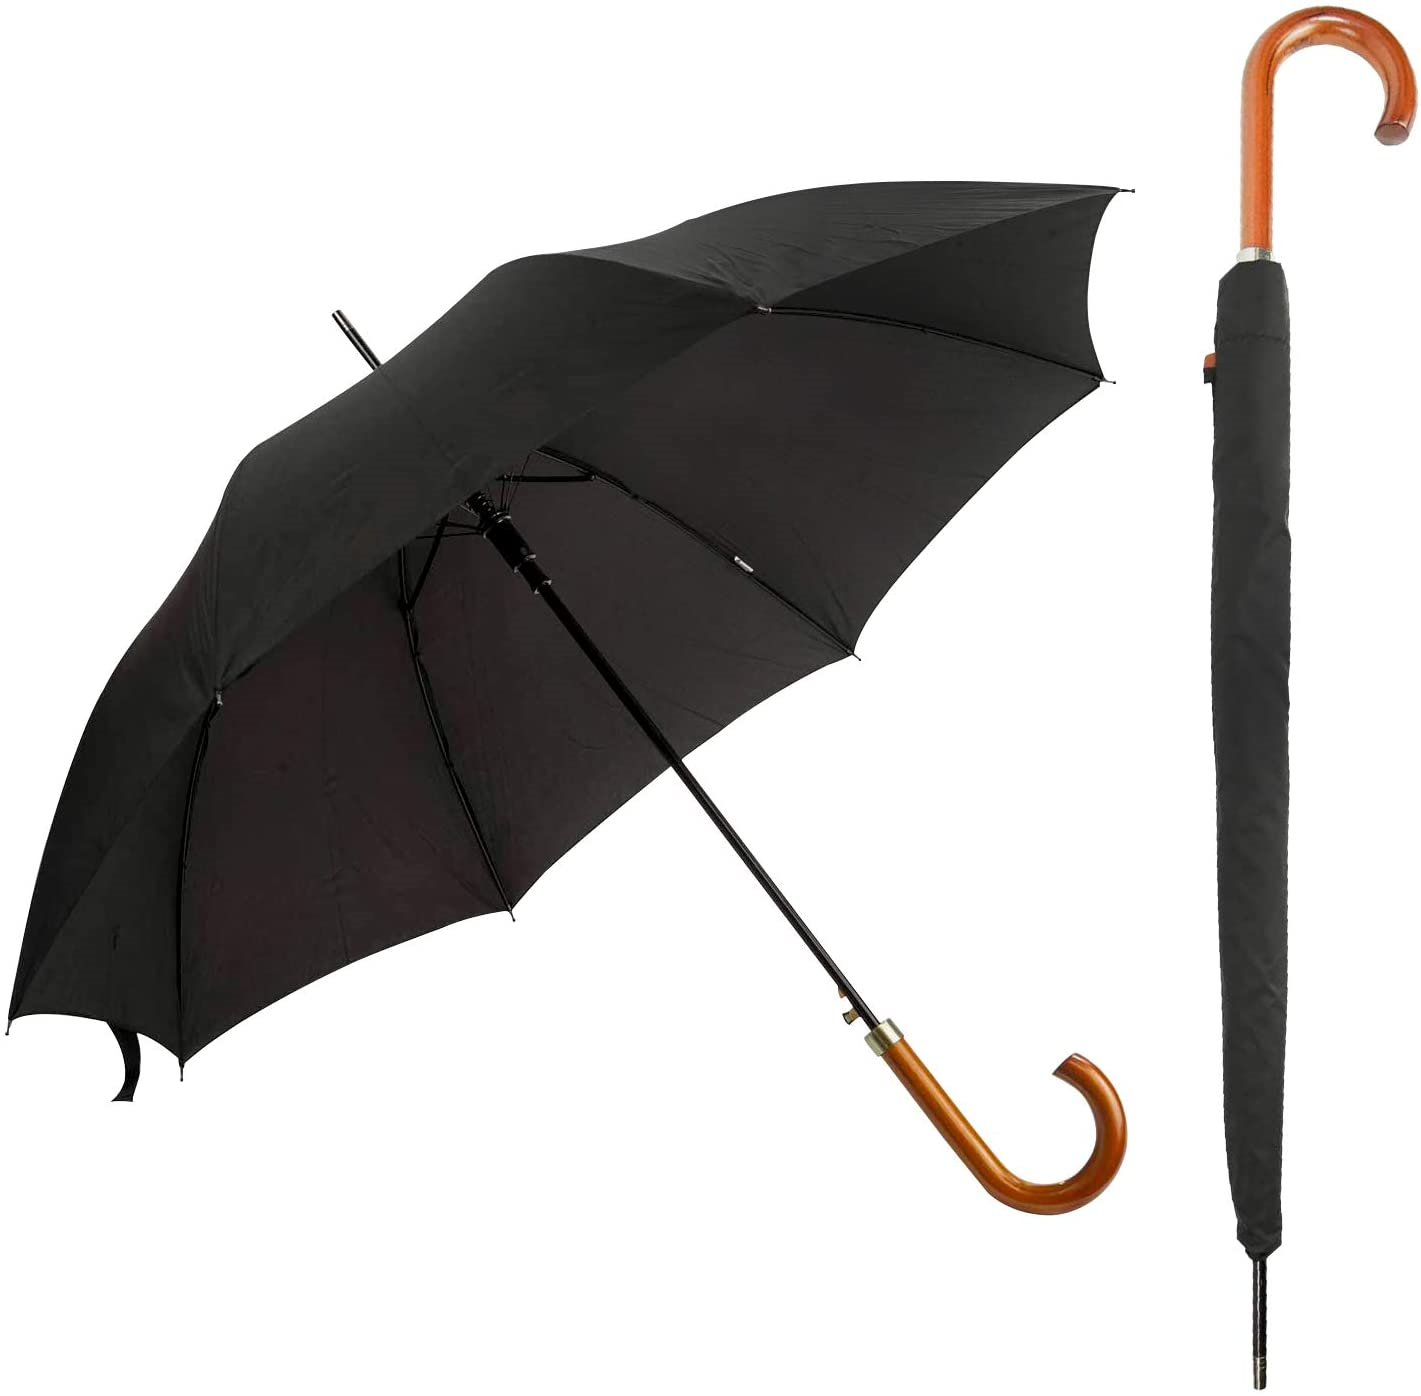 DUA Classic Gents Auto Walking Length Black Umbrella with Wood Handle, Sleeve &